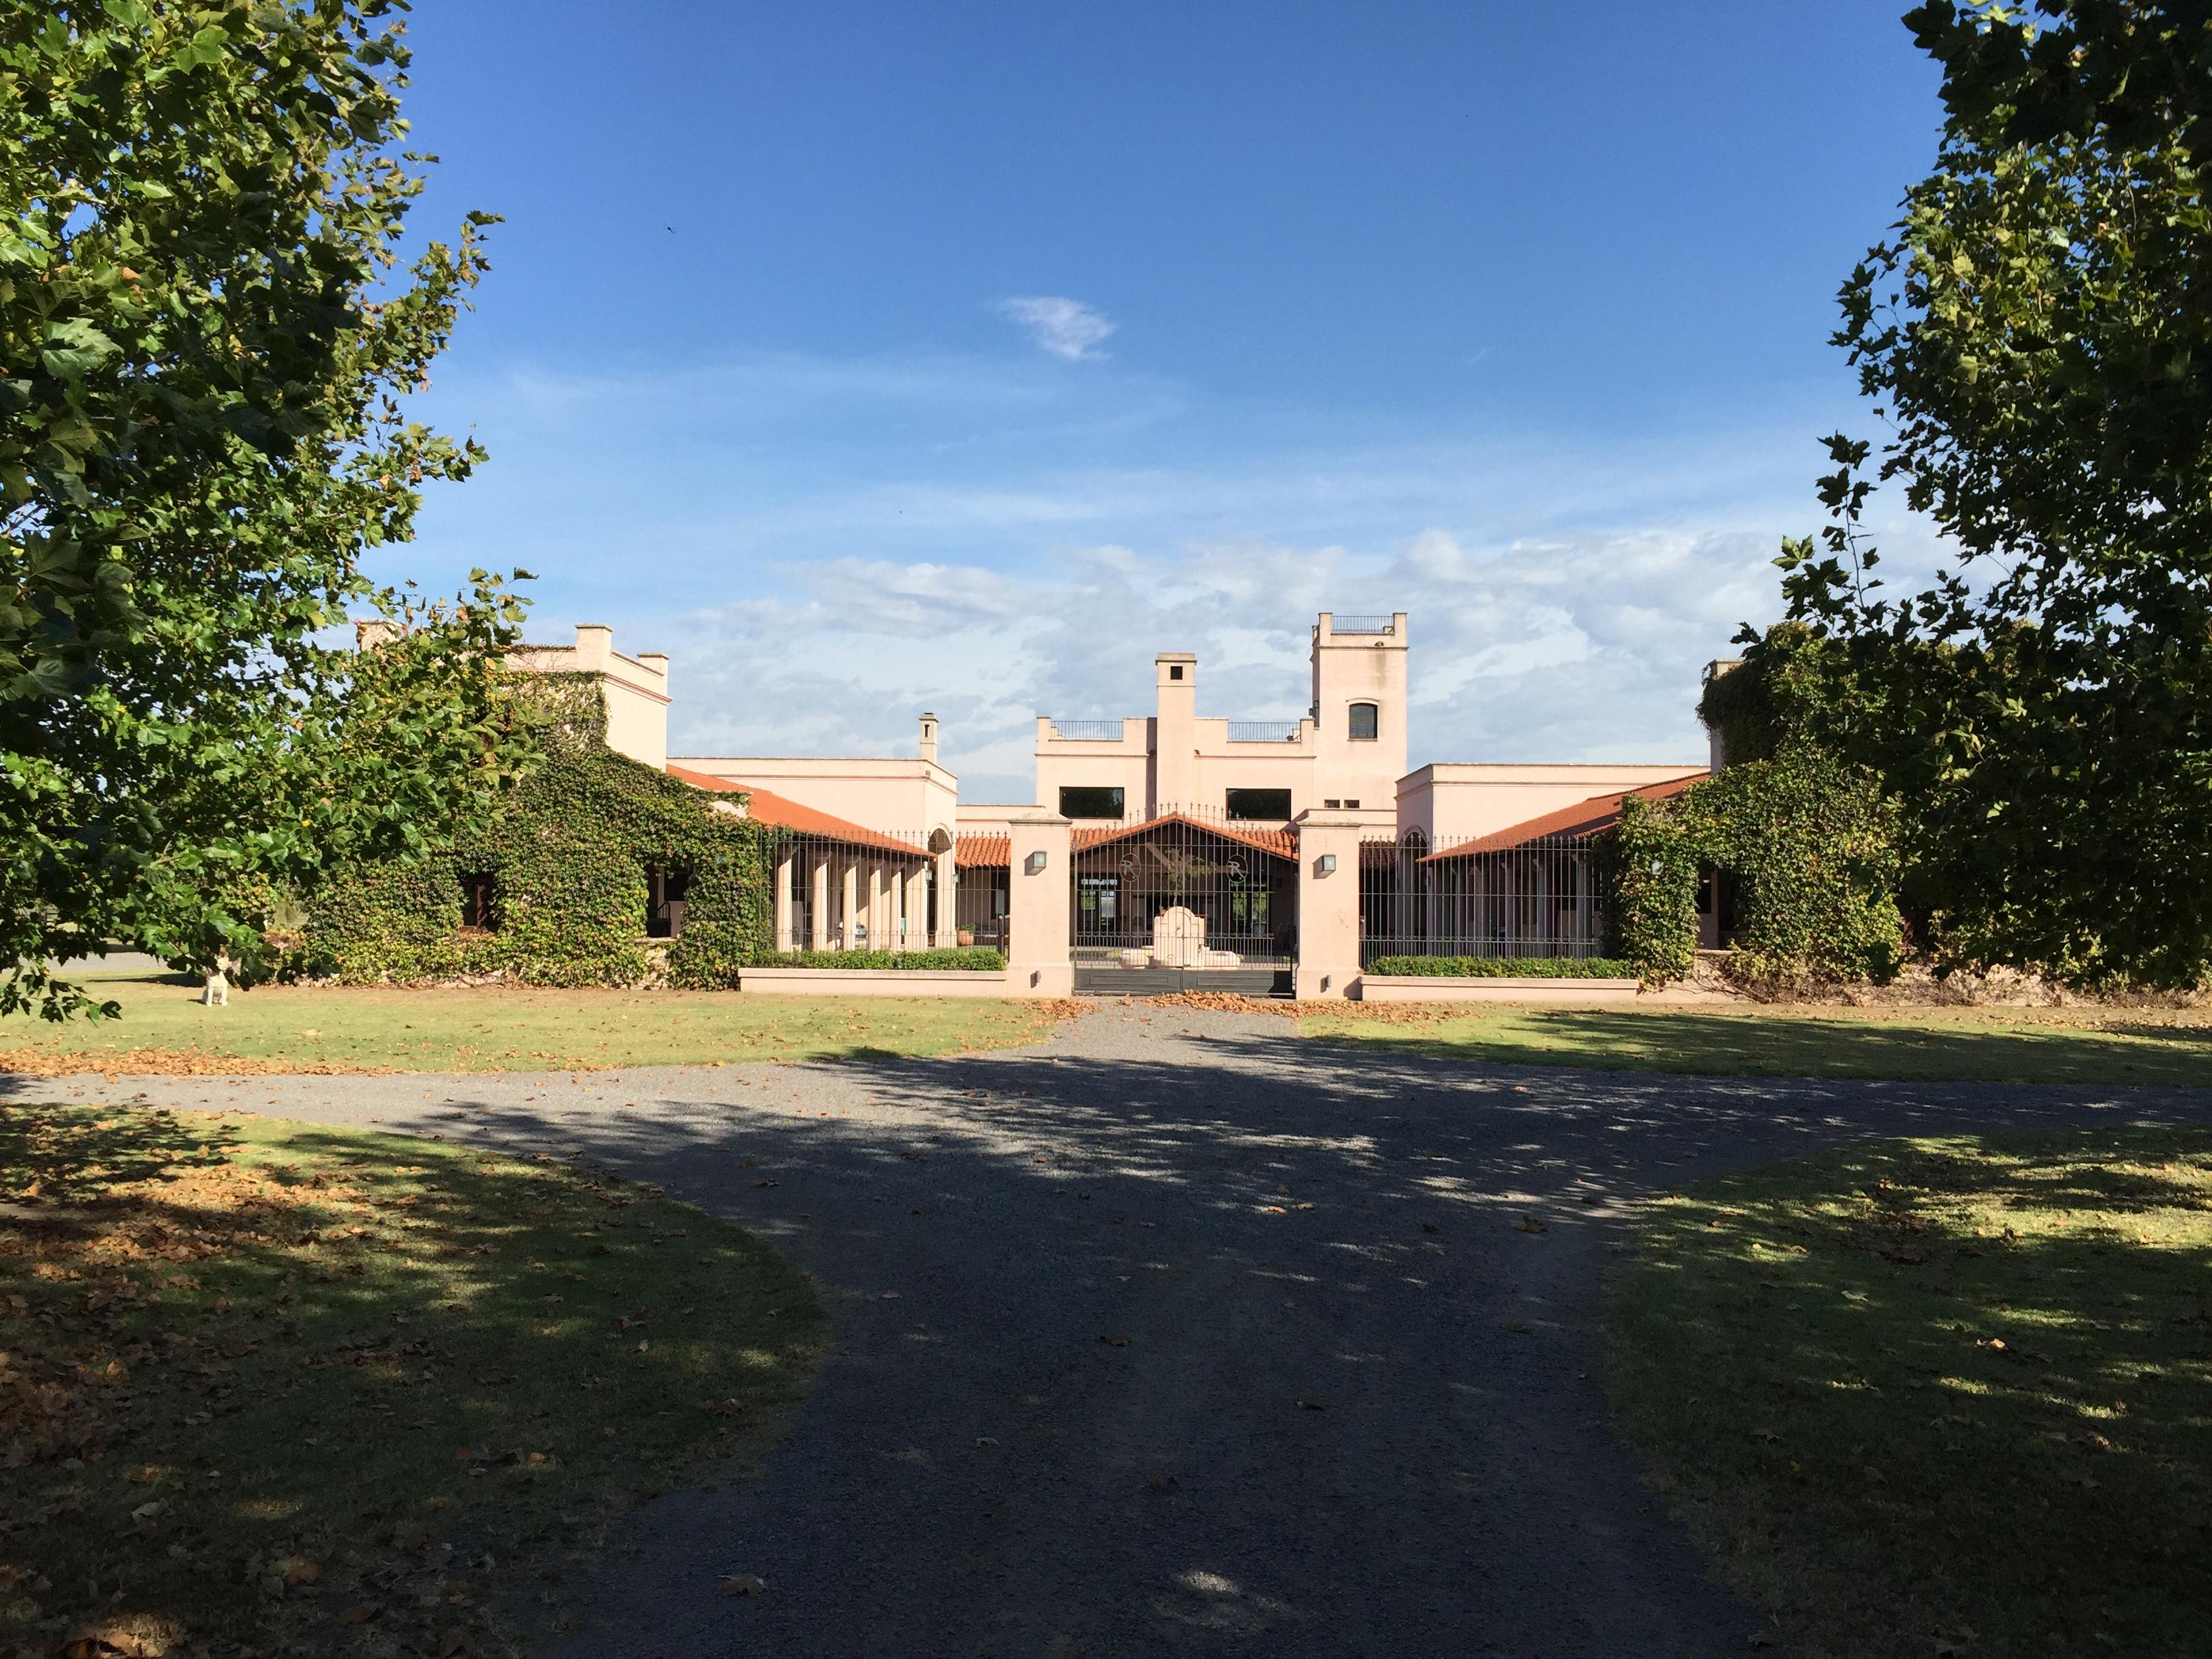 Ferme / Ranch / Plantation pour l Vente à Santa María de Lobos Polo Ranch Buenos Aires, Buenos Aires, Argentine